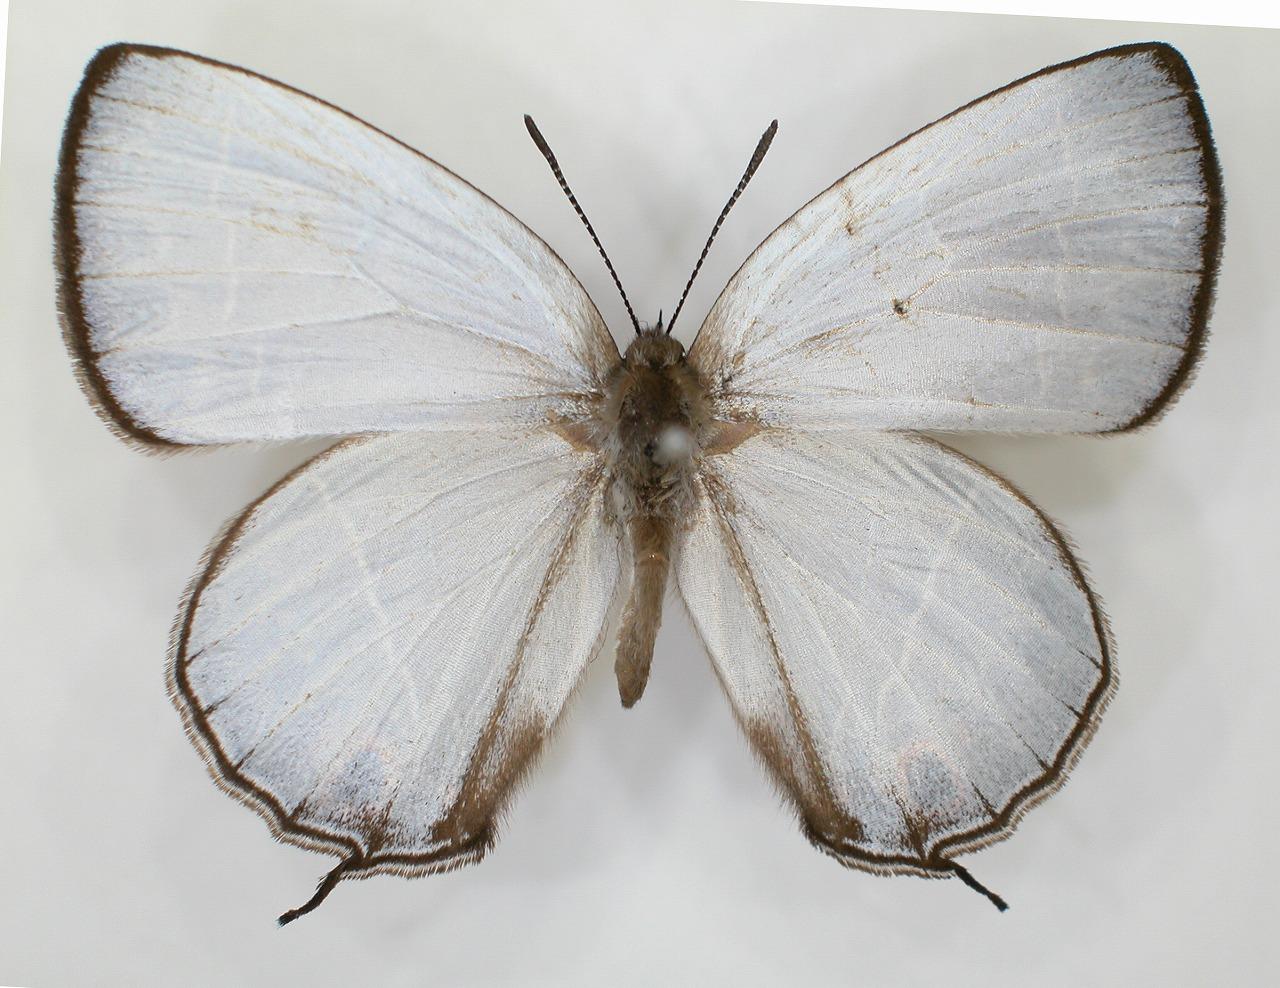 https://www.hitohaku.jp/material/l-material/butterfly-wing/5-lycaenidae/B1-637722_A.jpg